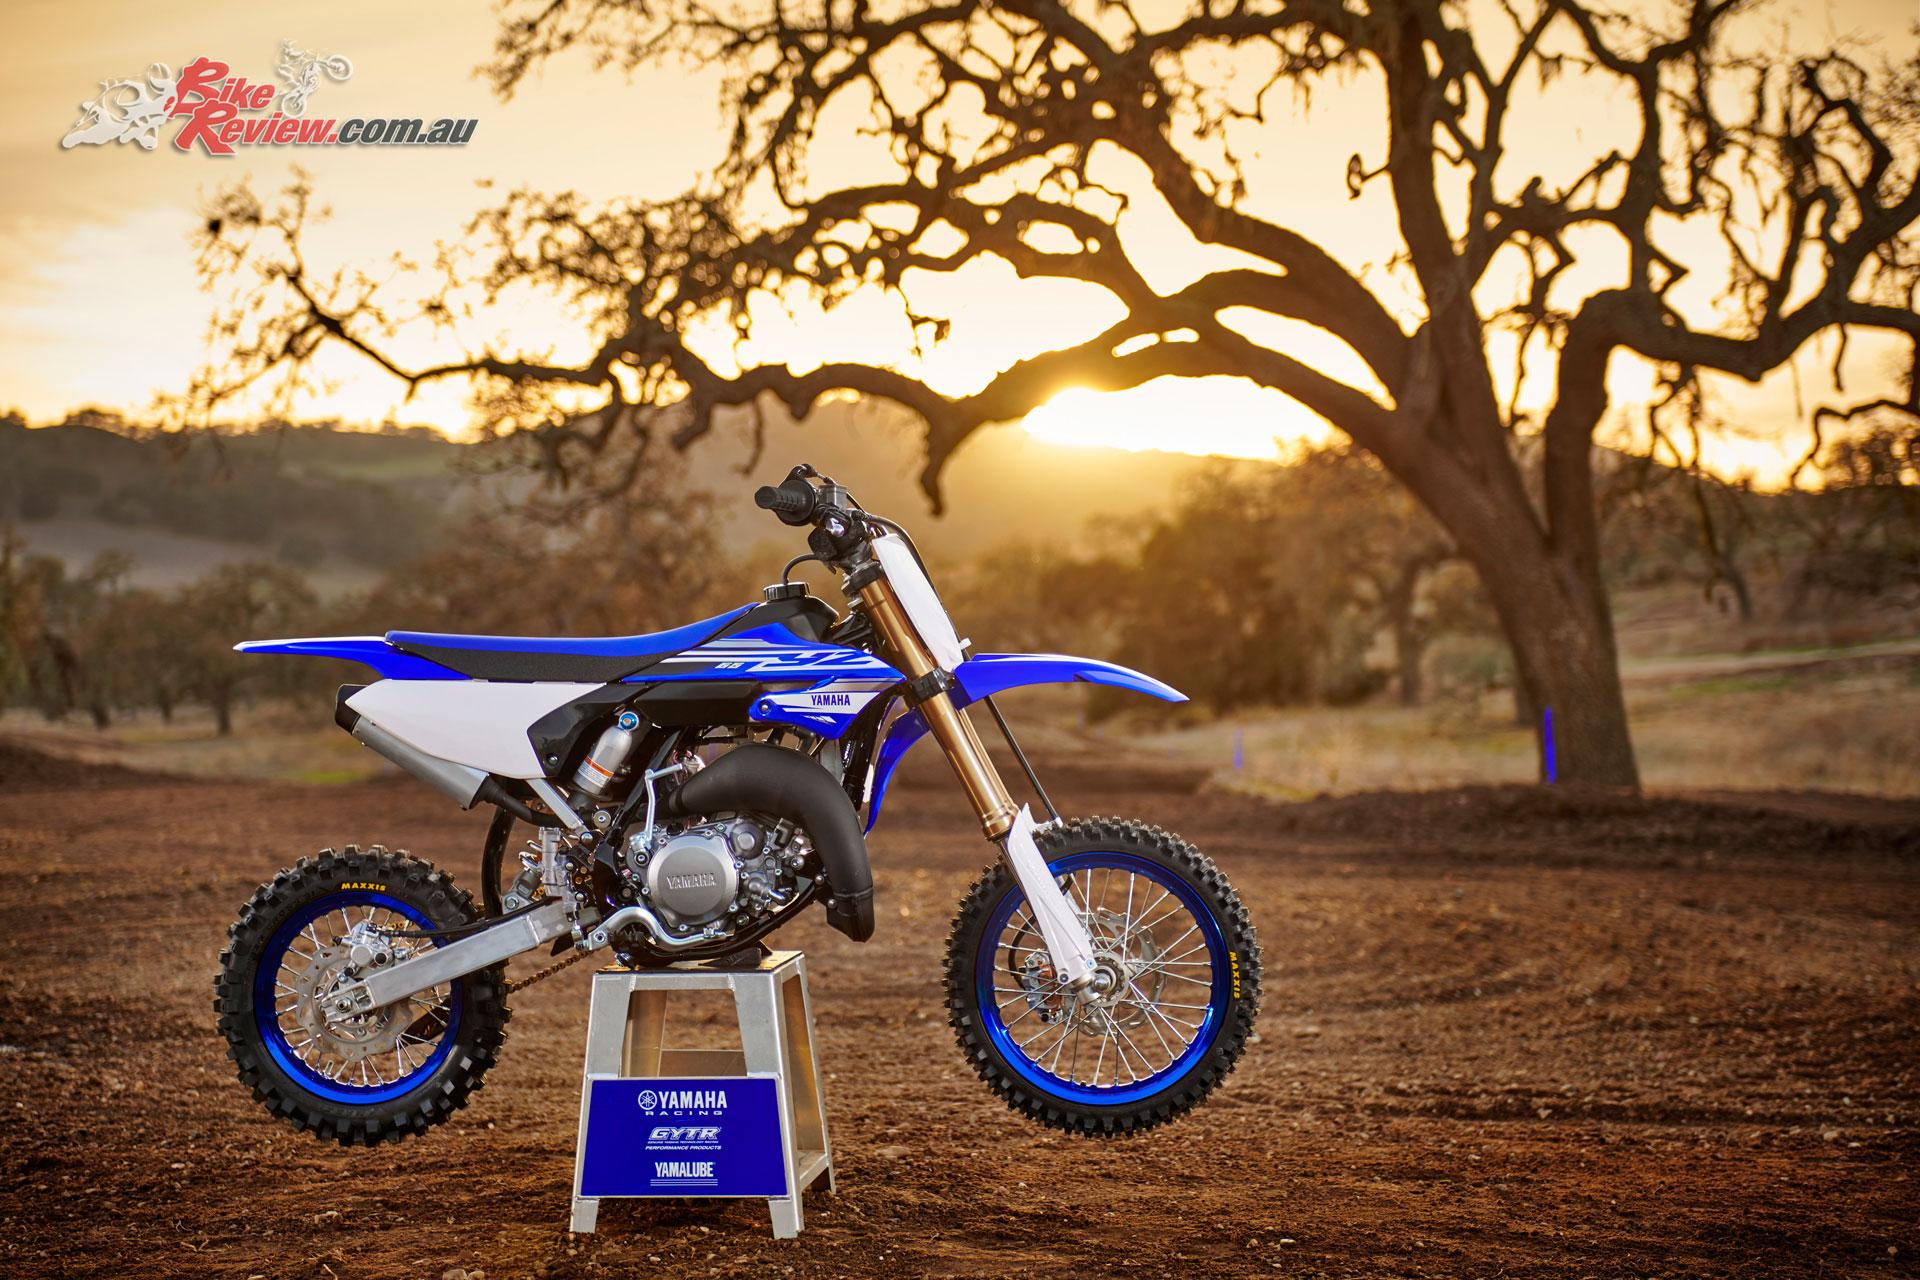 New Model: 2018 Yamaha YZ65 - Bike Review